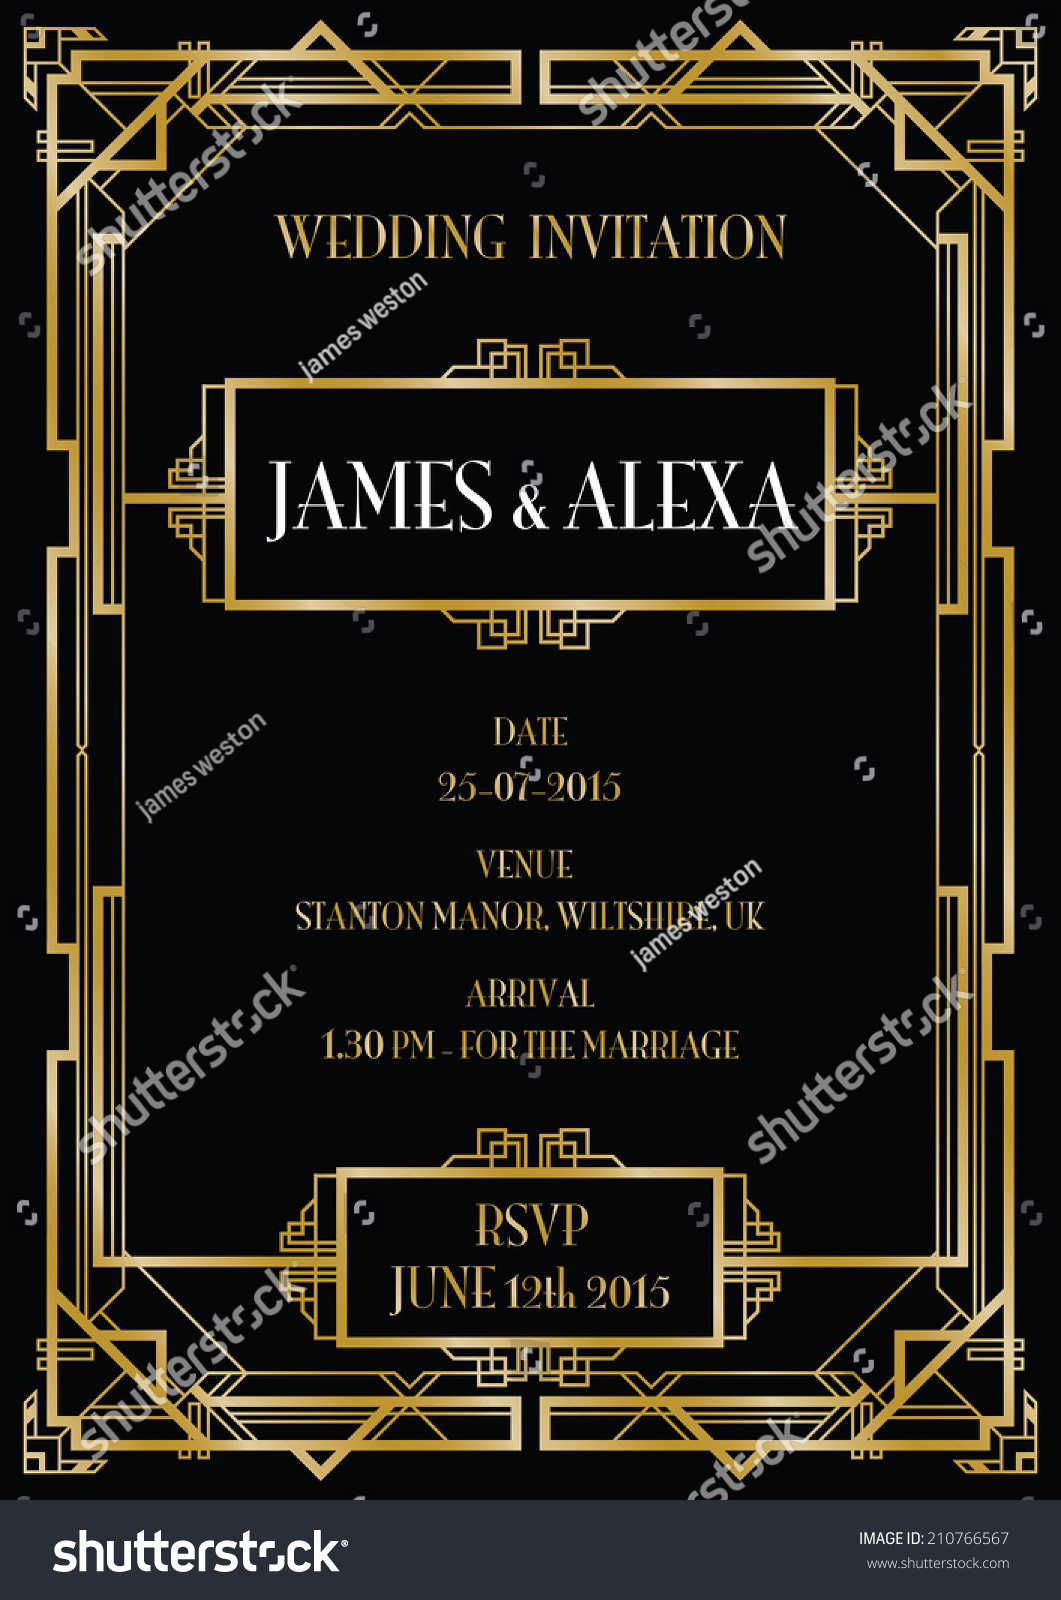 stock vector gatsby art deco wedding invite background gatsby wedding invitations gatsby art deco wedding invite background